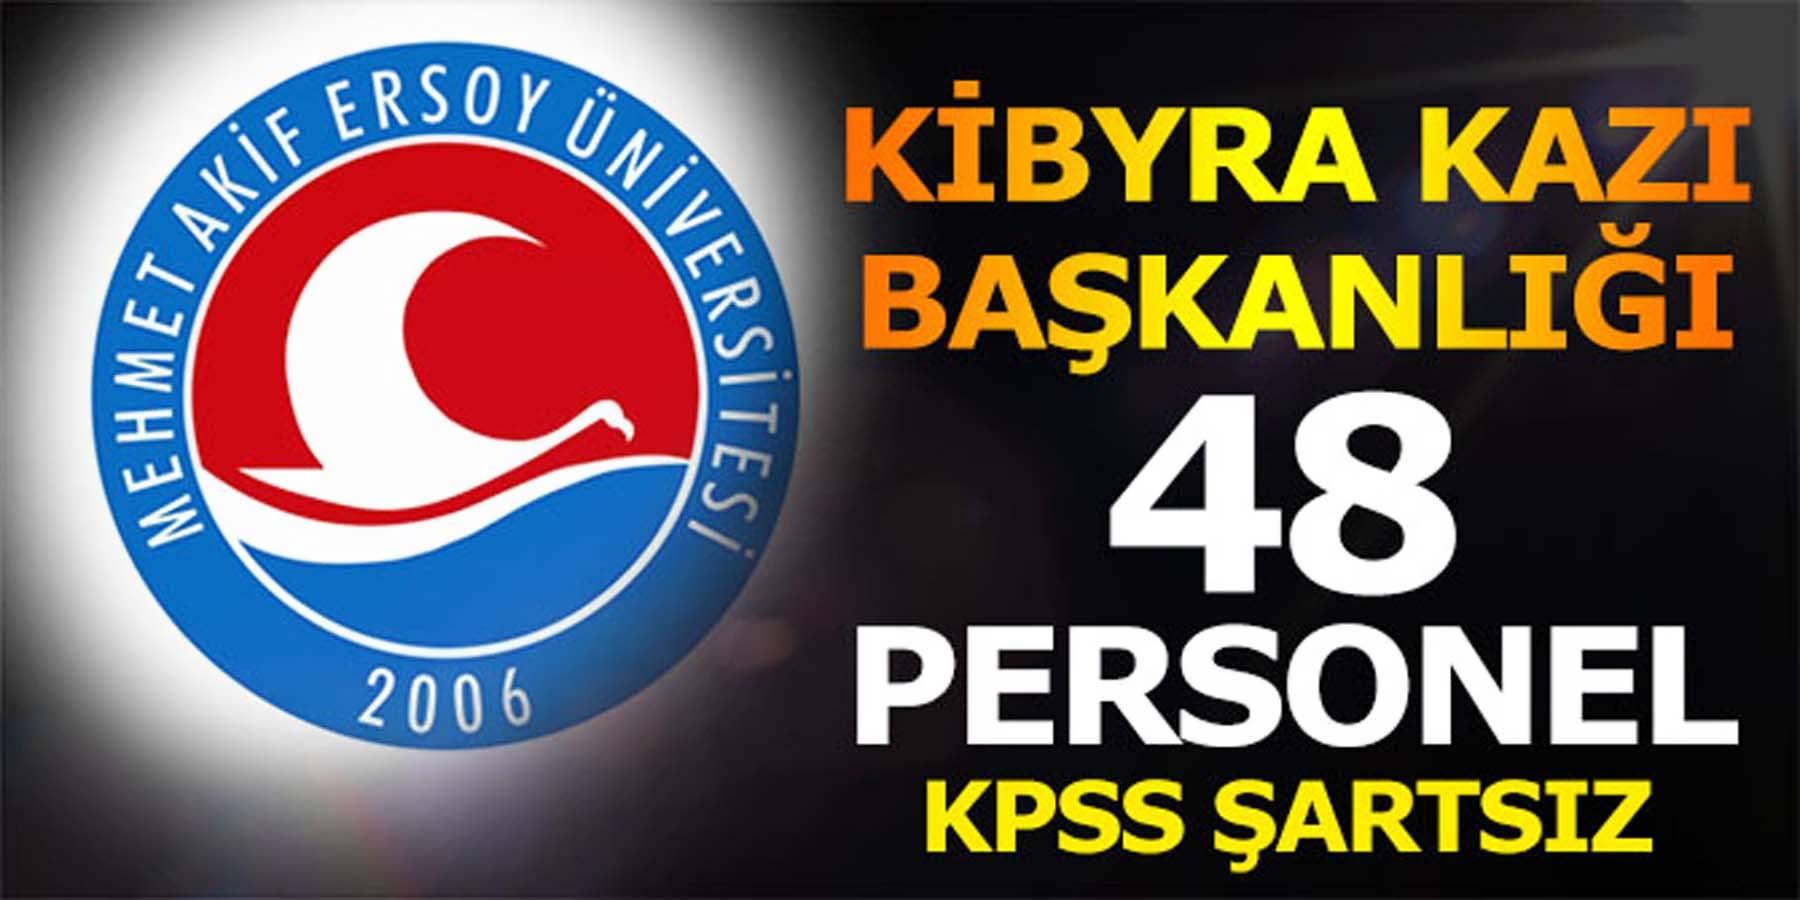 Kibyra Kazı Başkanlığı 43 Personel Alımı